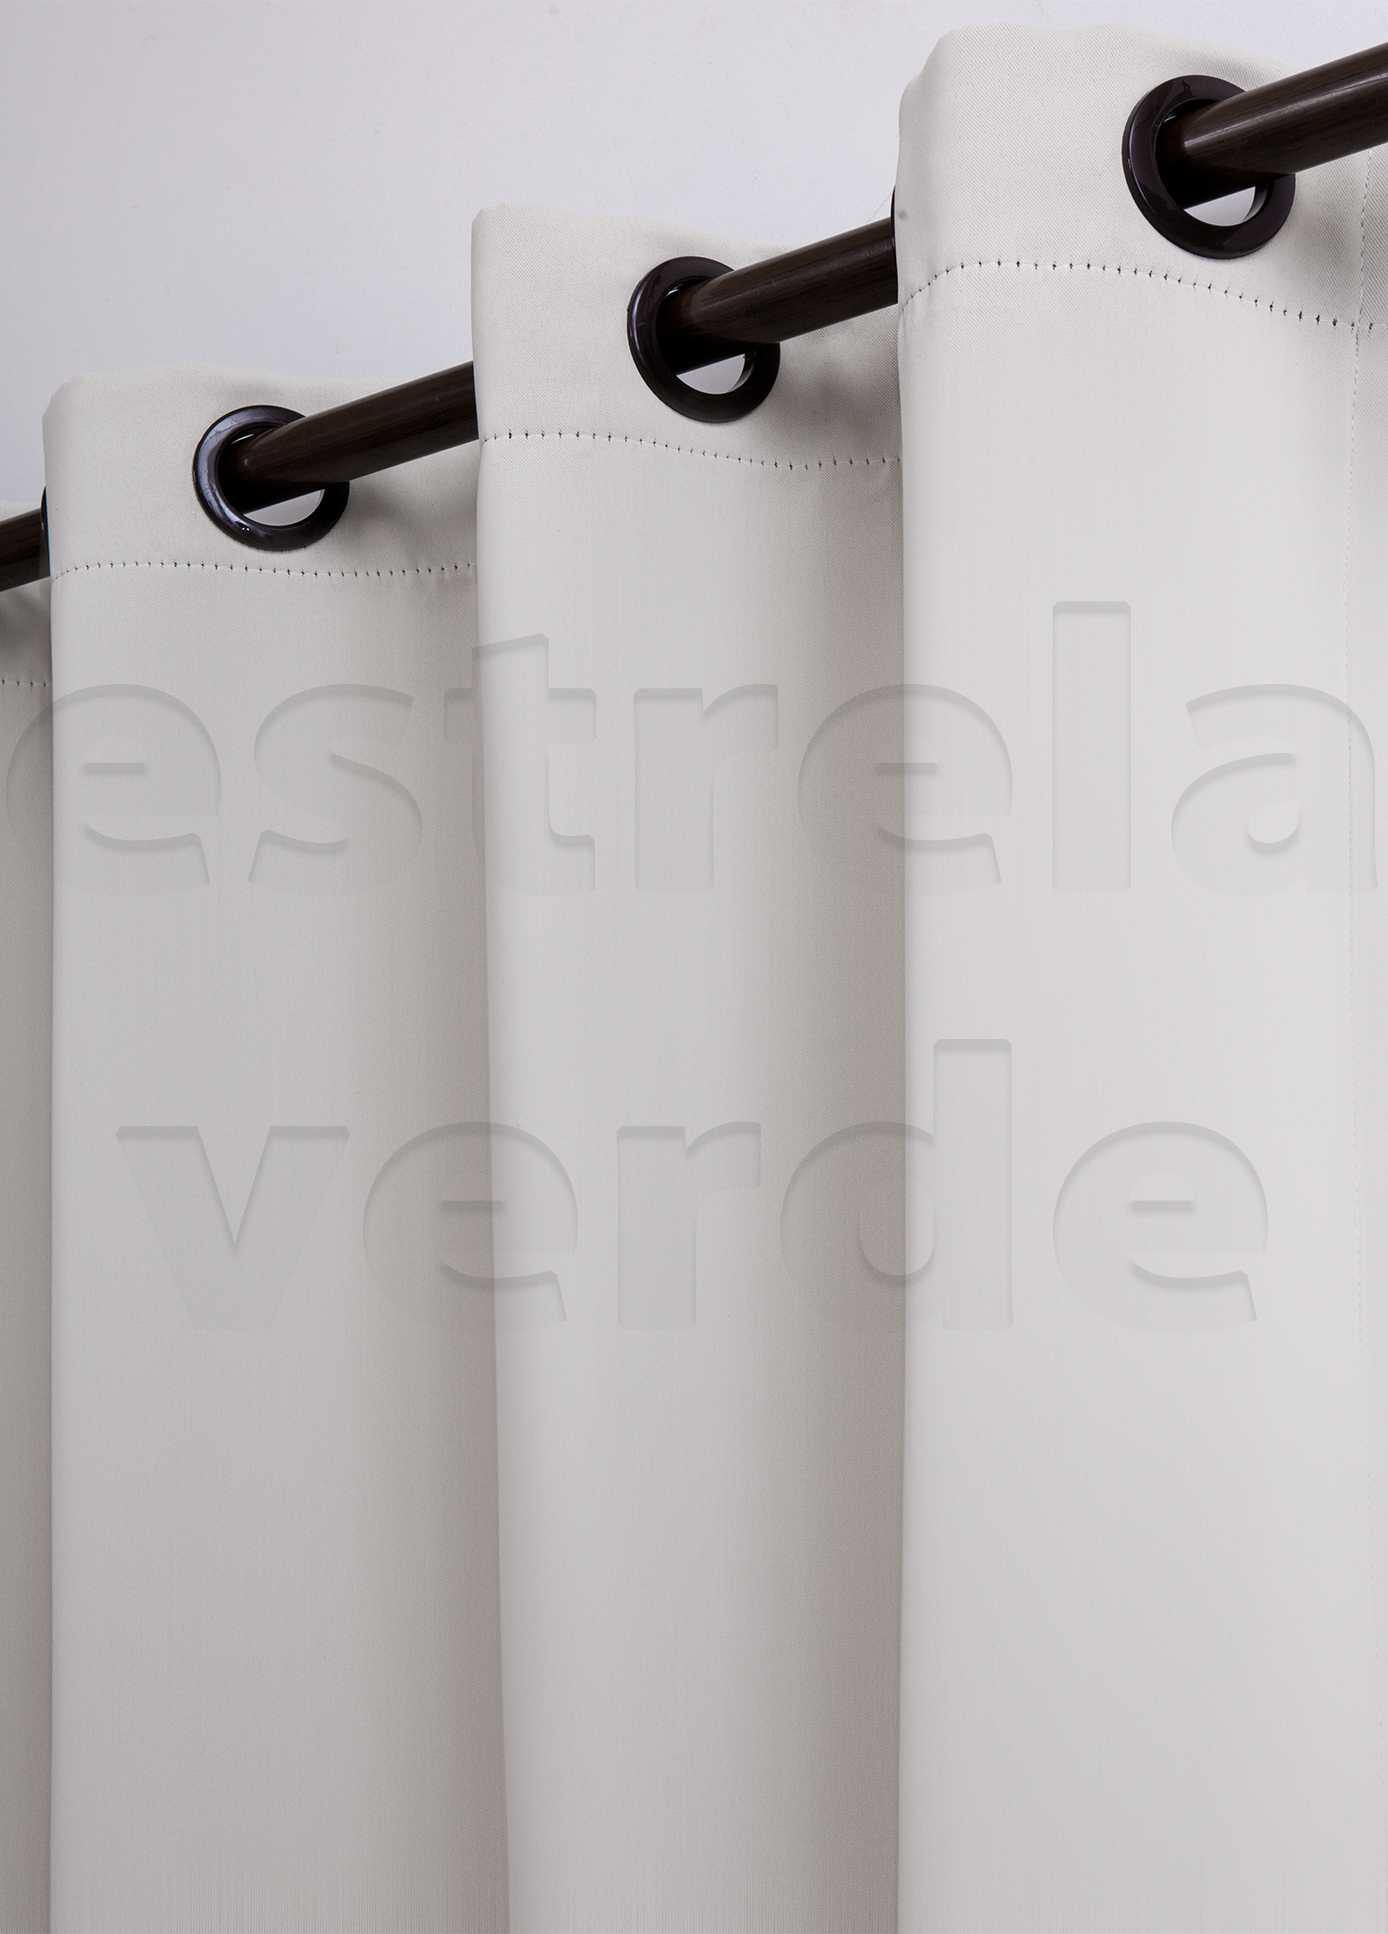 CORTINA BLACKOUT 2,60X2,30 6000 PALHA  - Estrela Verde